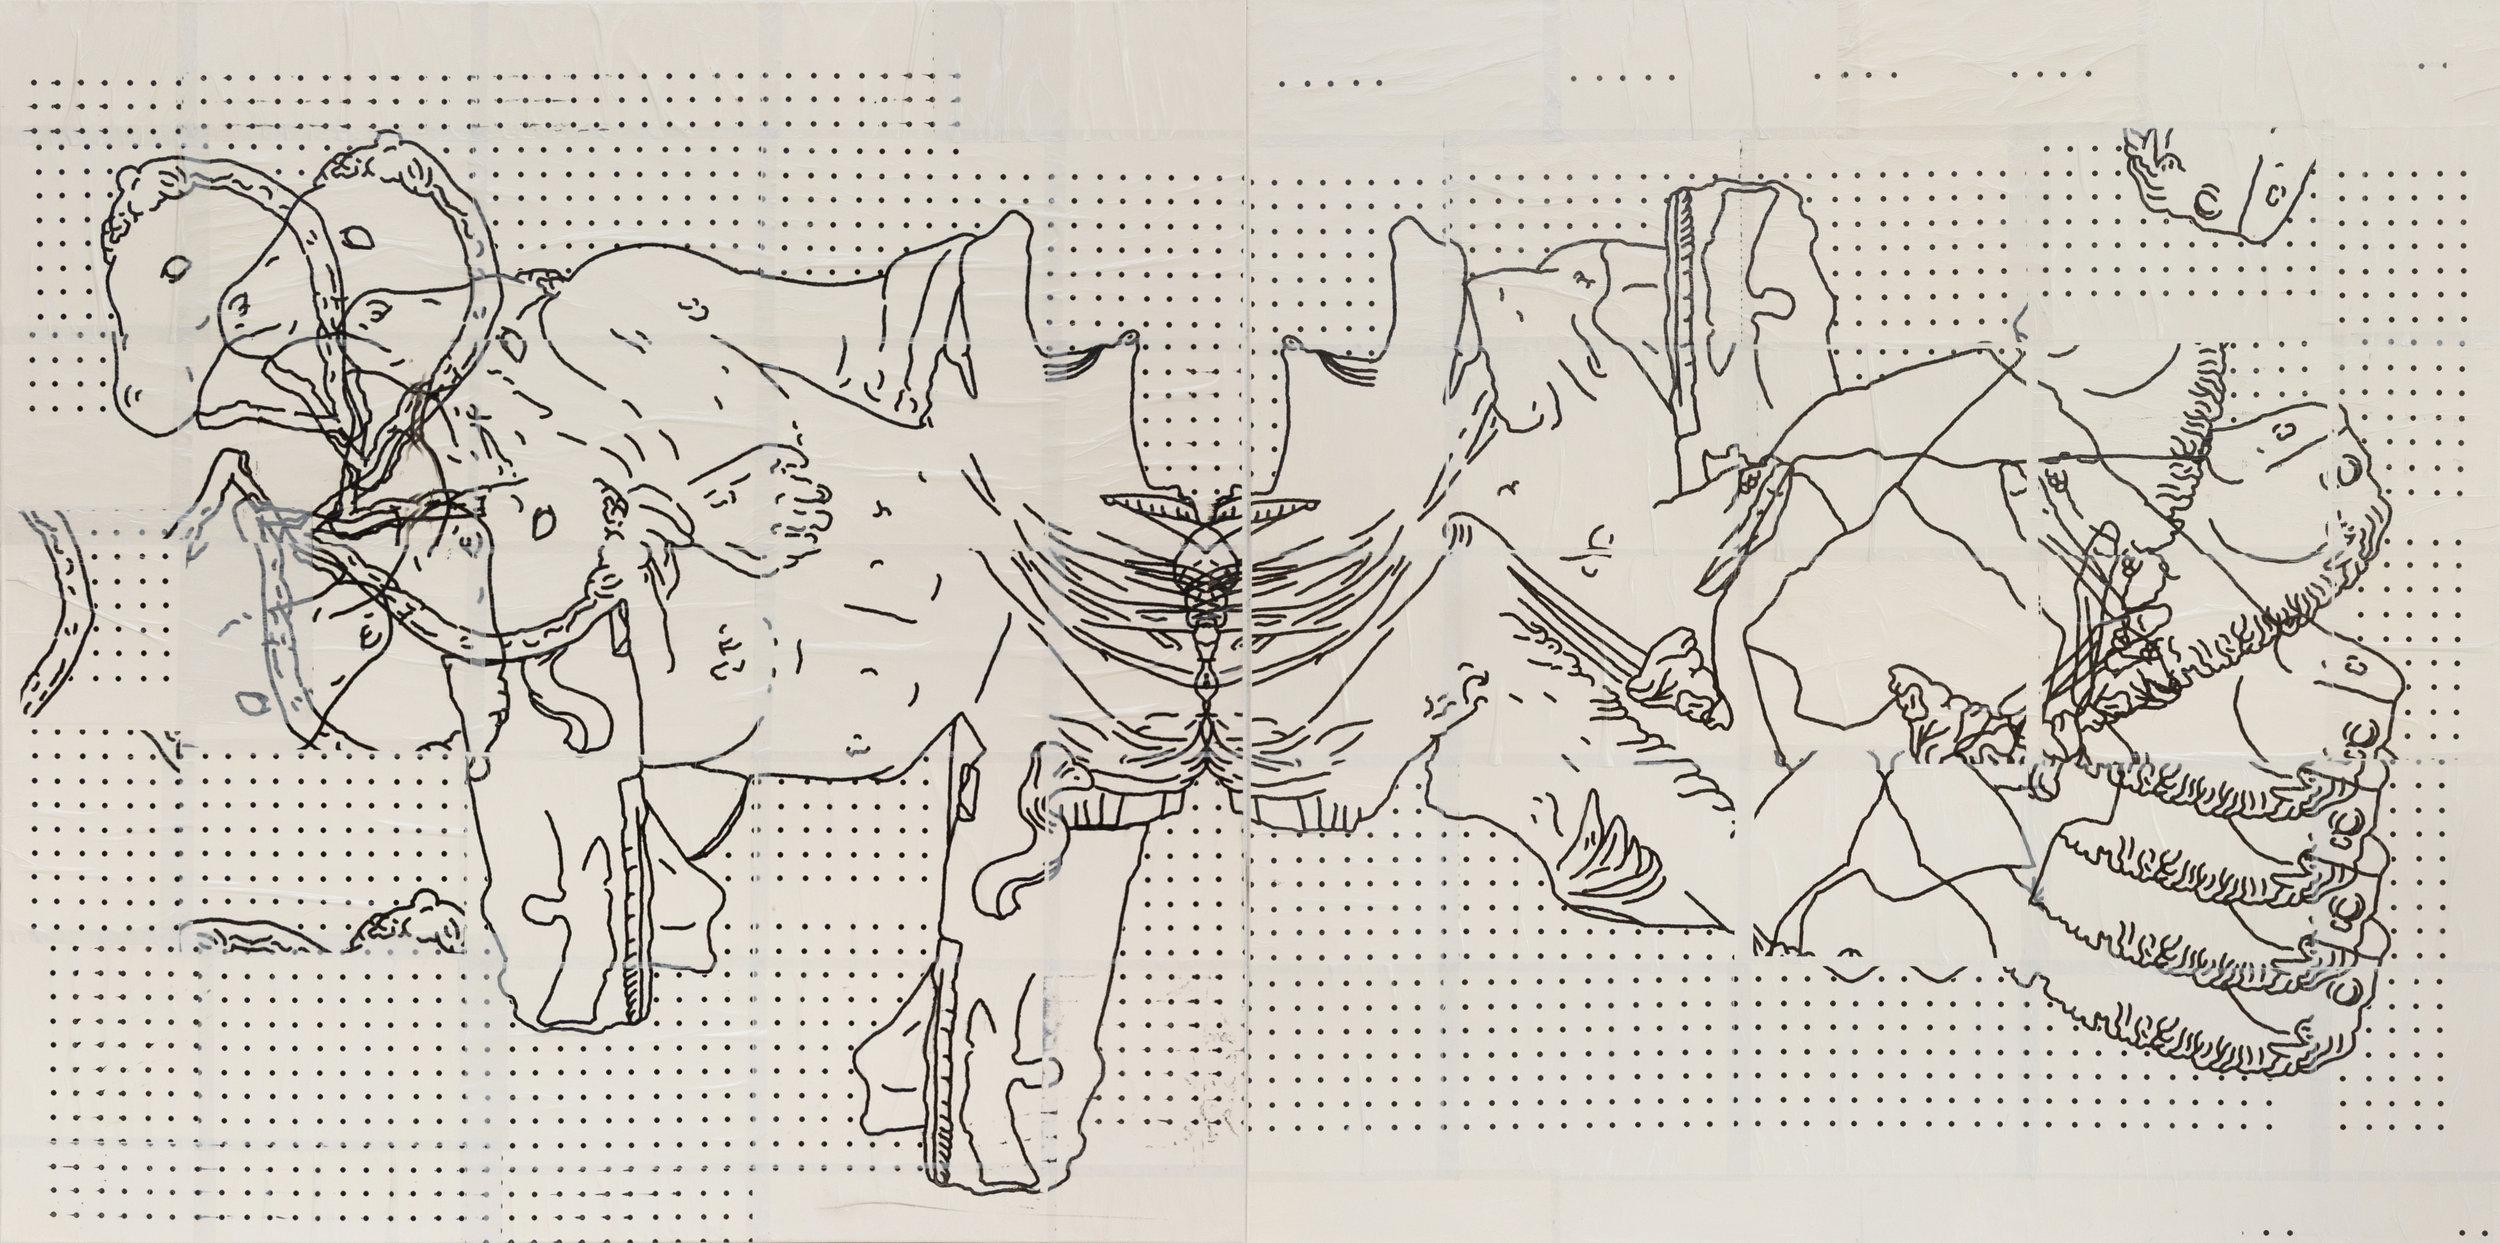 _ID 818_ - 120 x 240 cm - Pieza 1 - 120 x 120 - Pieza 2 - 120 x 120 - Acrílico, inkjet, mod podge, papel transparente, pegamento sobre tela - 2019.jpg